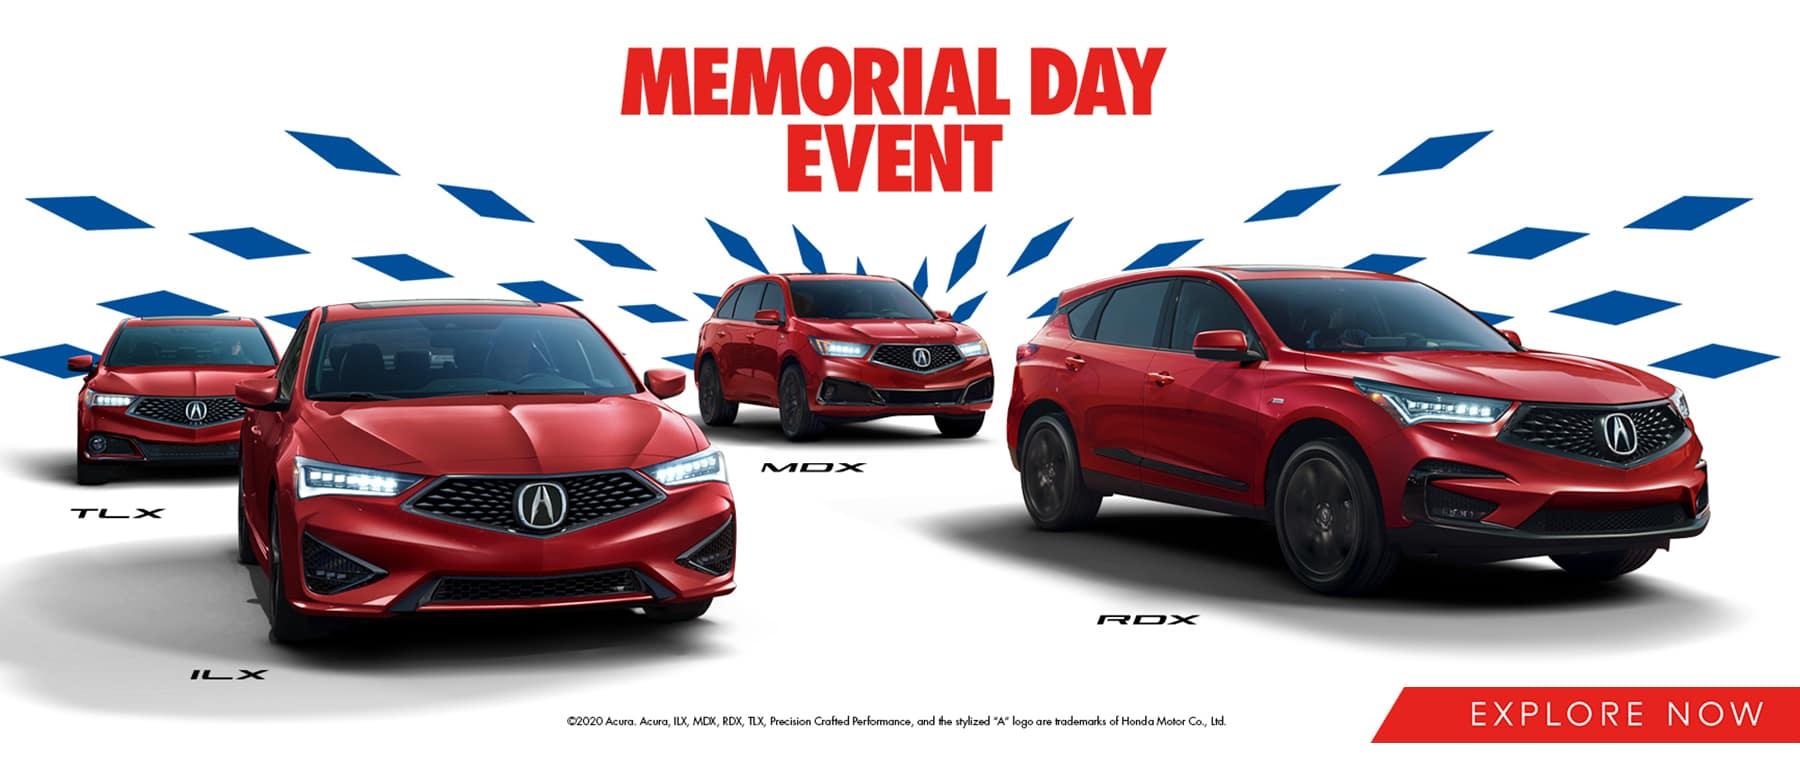 Acura Memorial Day Sales Event